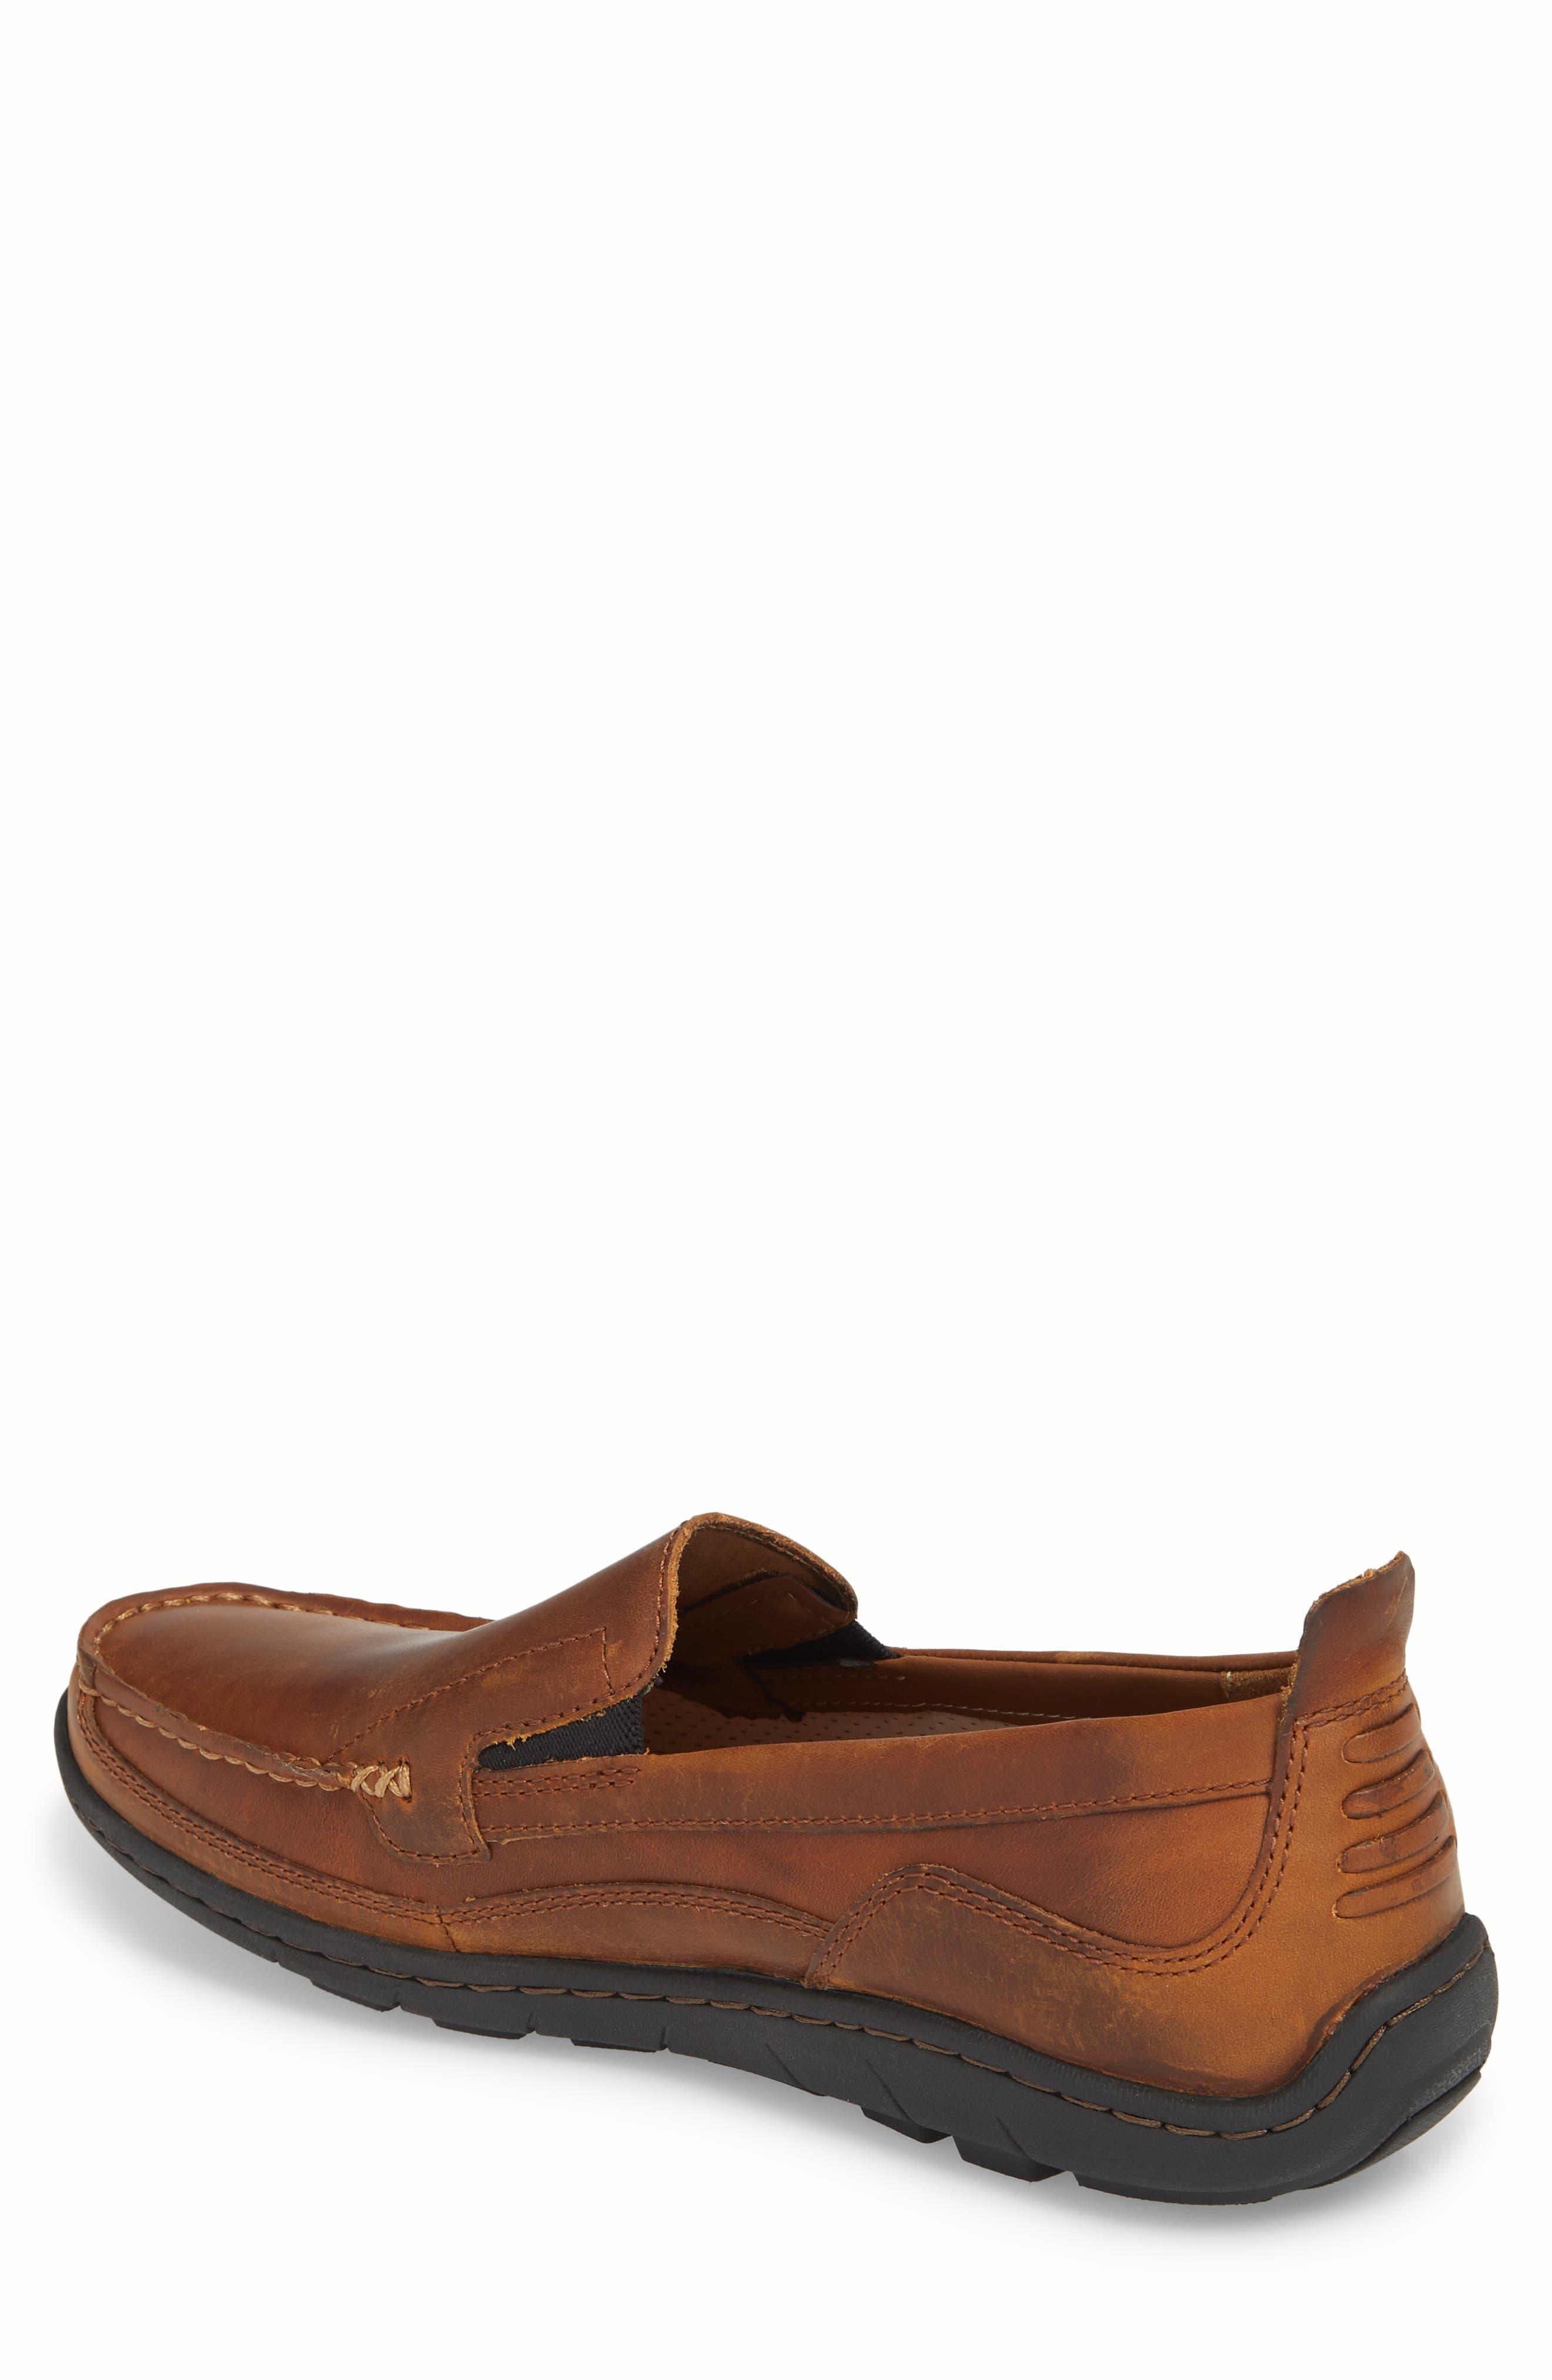 Sandspoint Venetian Loafer,                             Alternate thumbnail 2, color,                             Tan Old Harness